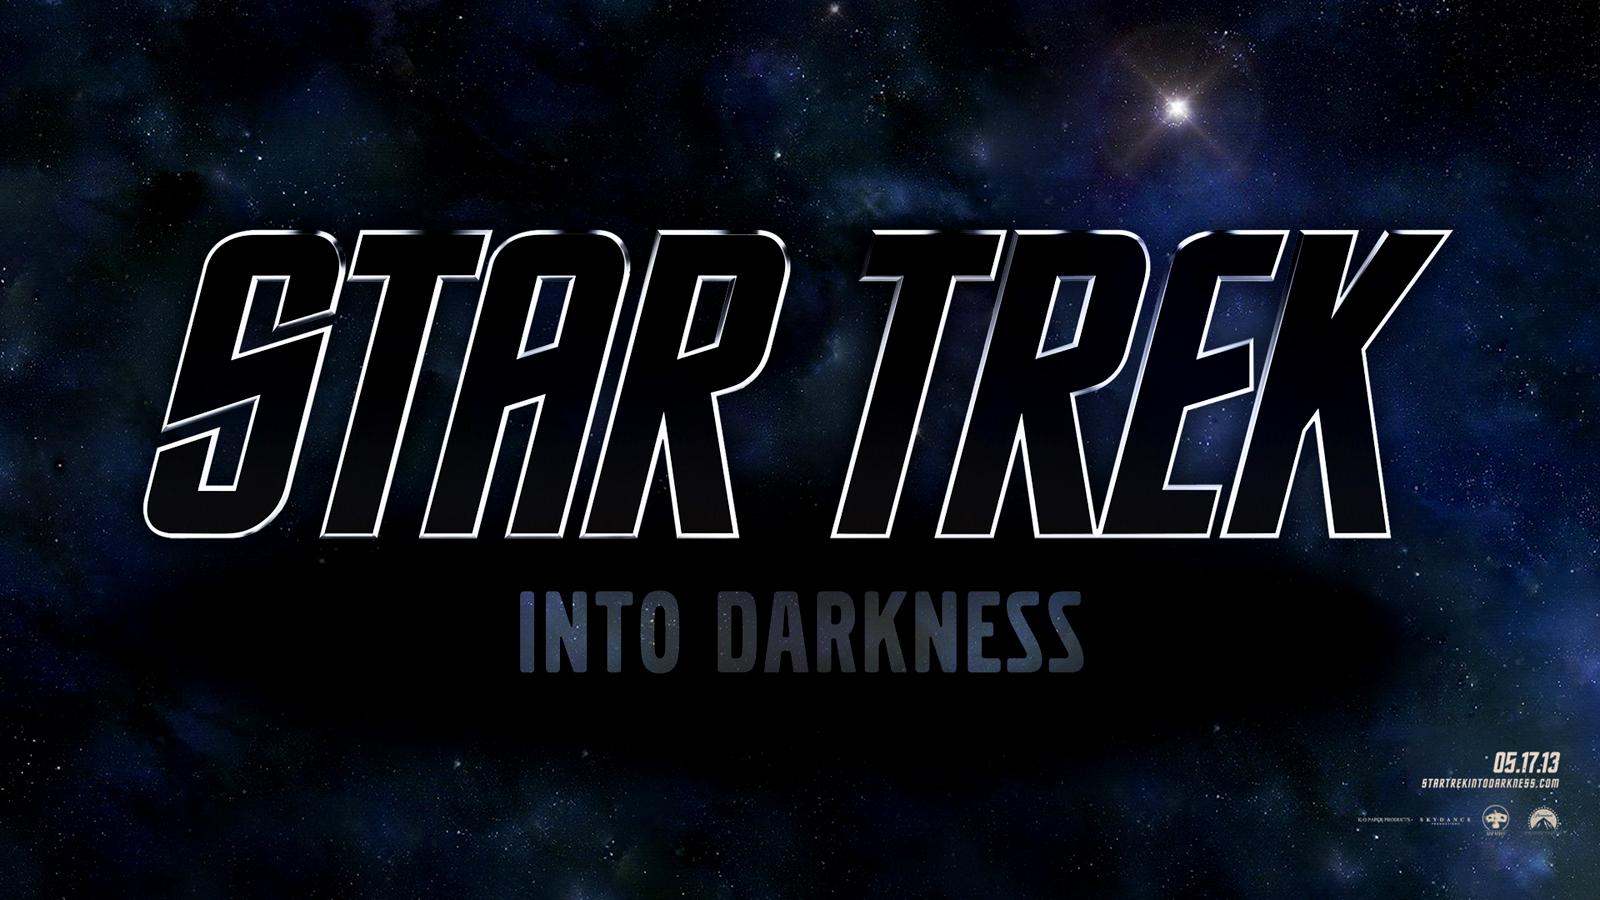 Star Trek Into Darkness 2013 Movie HD WallpapersImage to Wallpaper 1600x900